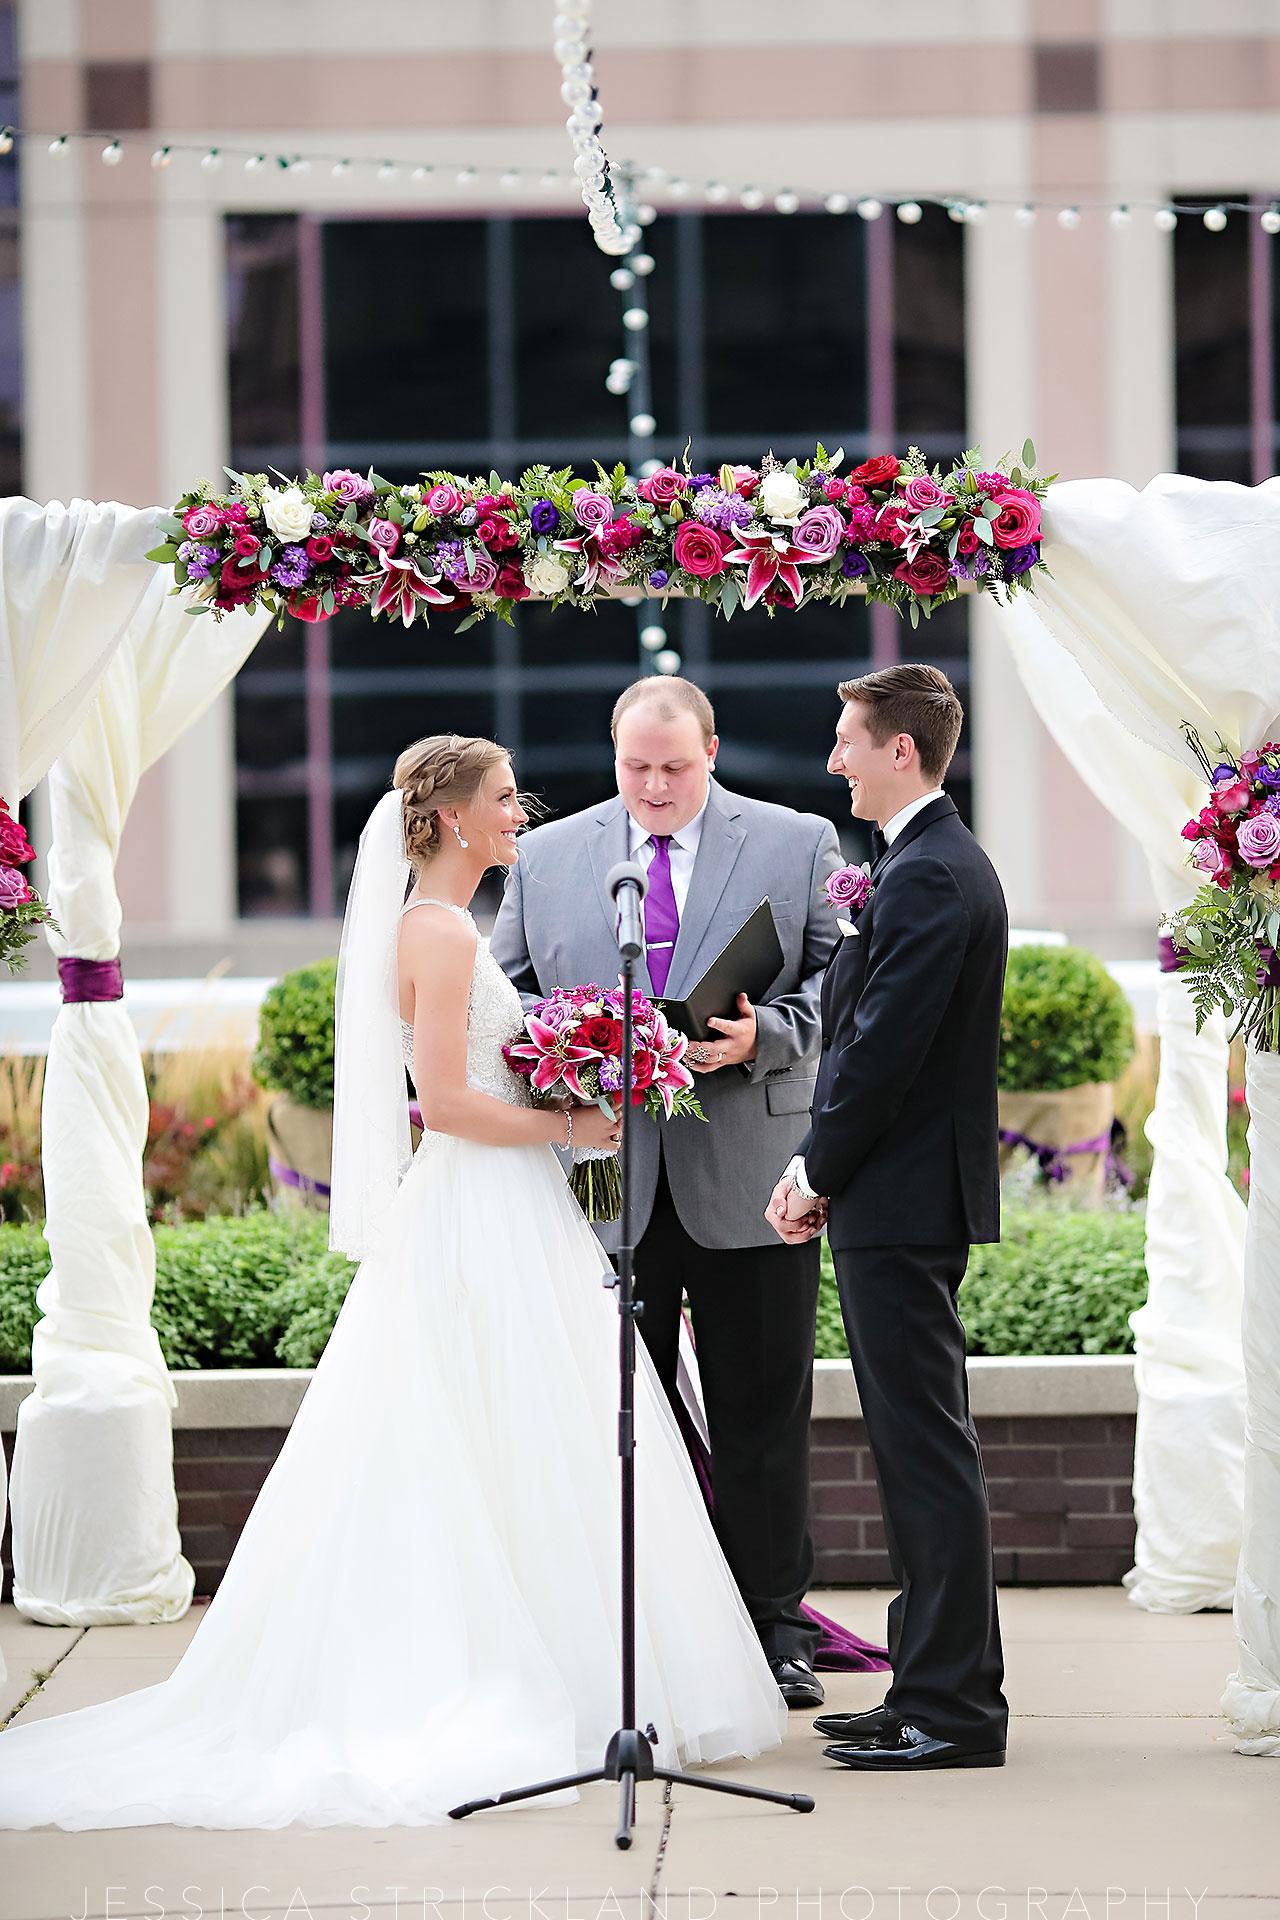 Serra Alex Regions Tower Indianapolis Wedding 163 watermarked